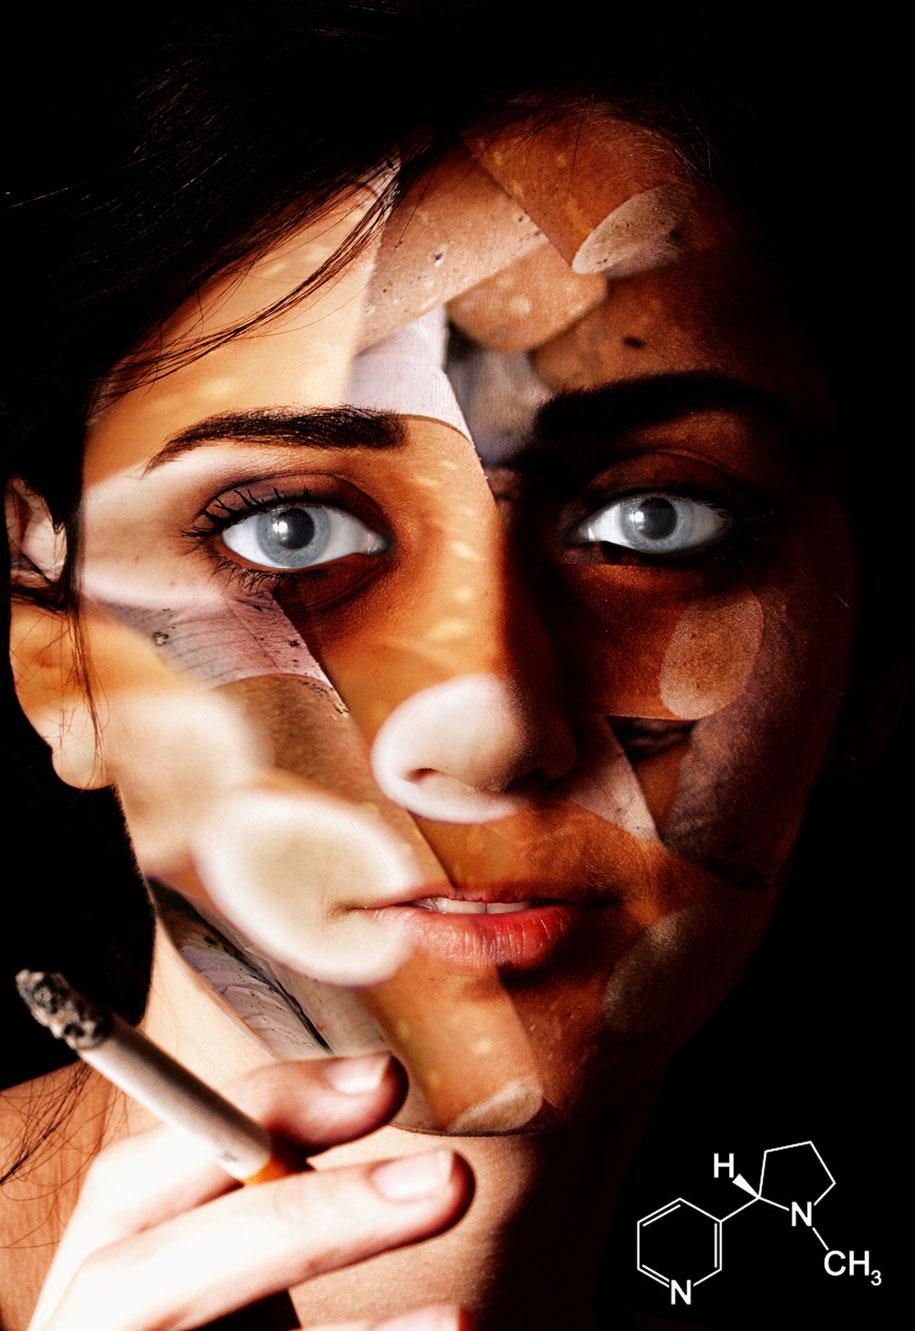 people-using-drugs-portraits-inebrination-les-baker-v-11